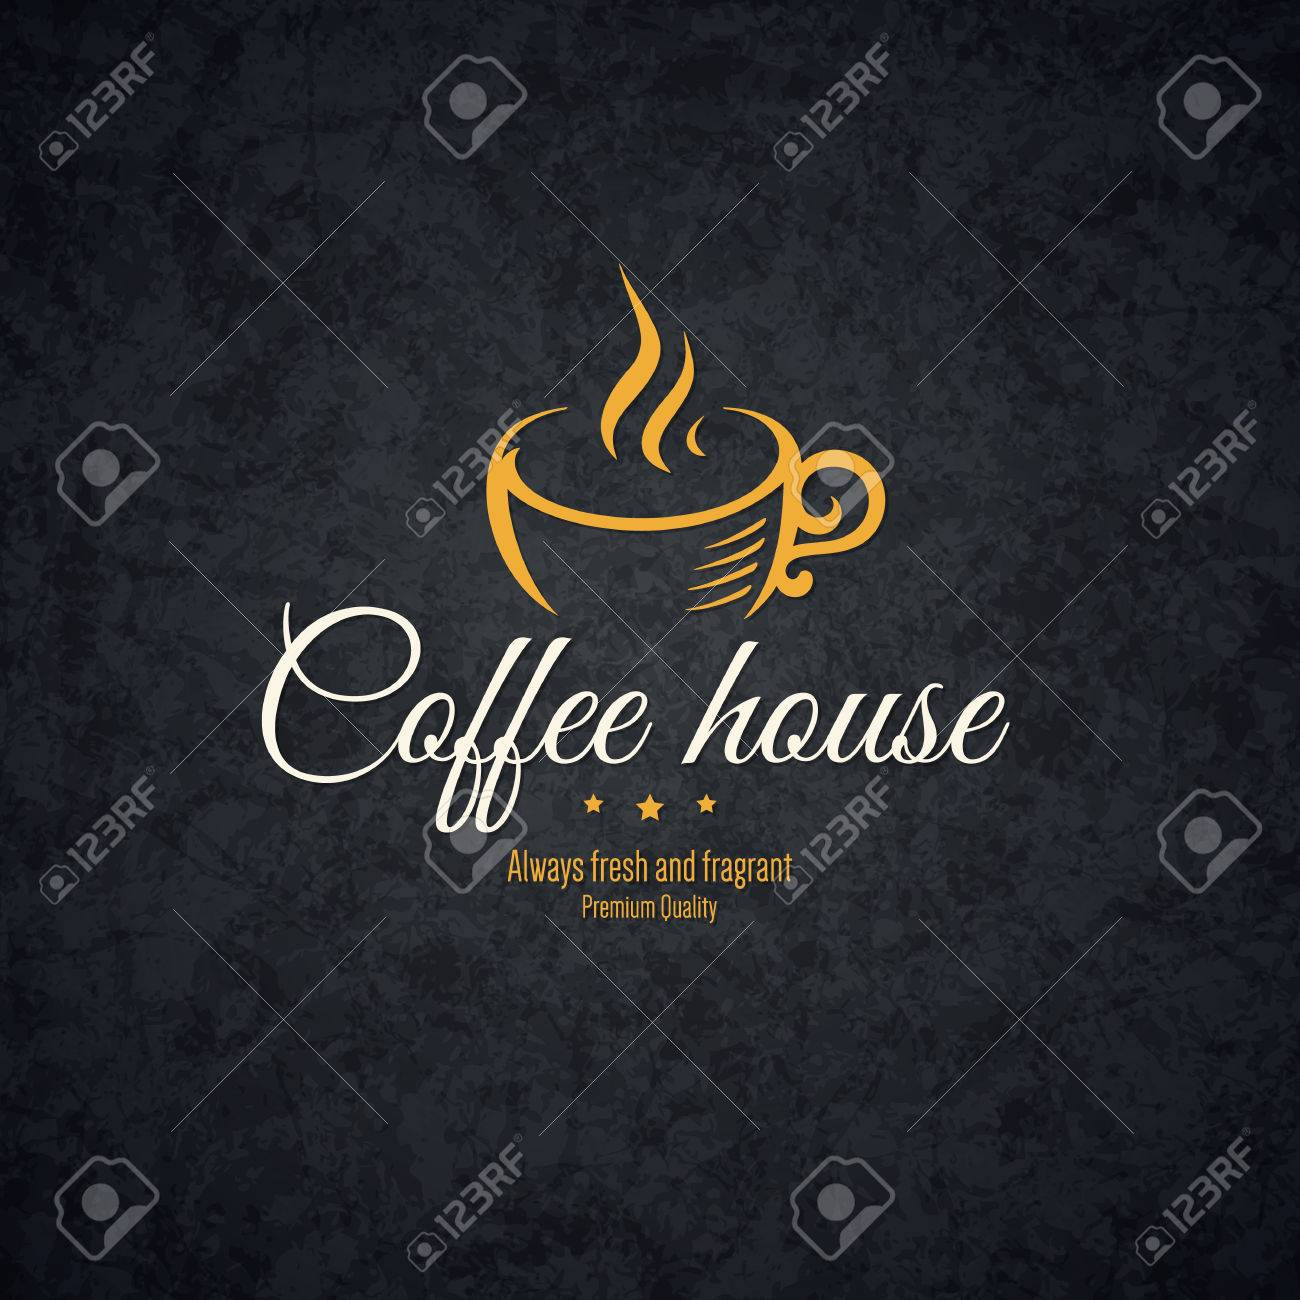 Vintage design for coffee house, cafeteria, bars, restaurant, tea shop - 43961251